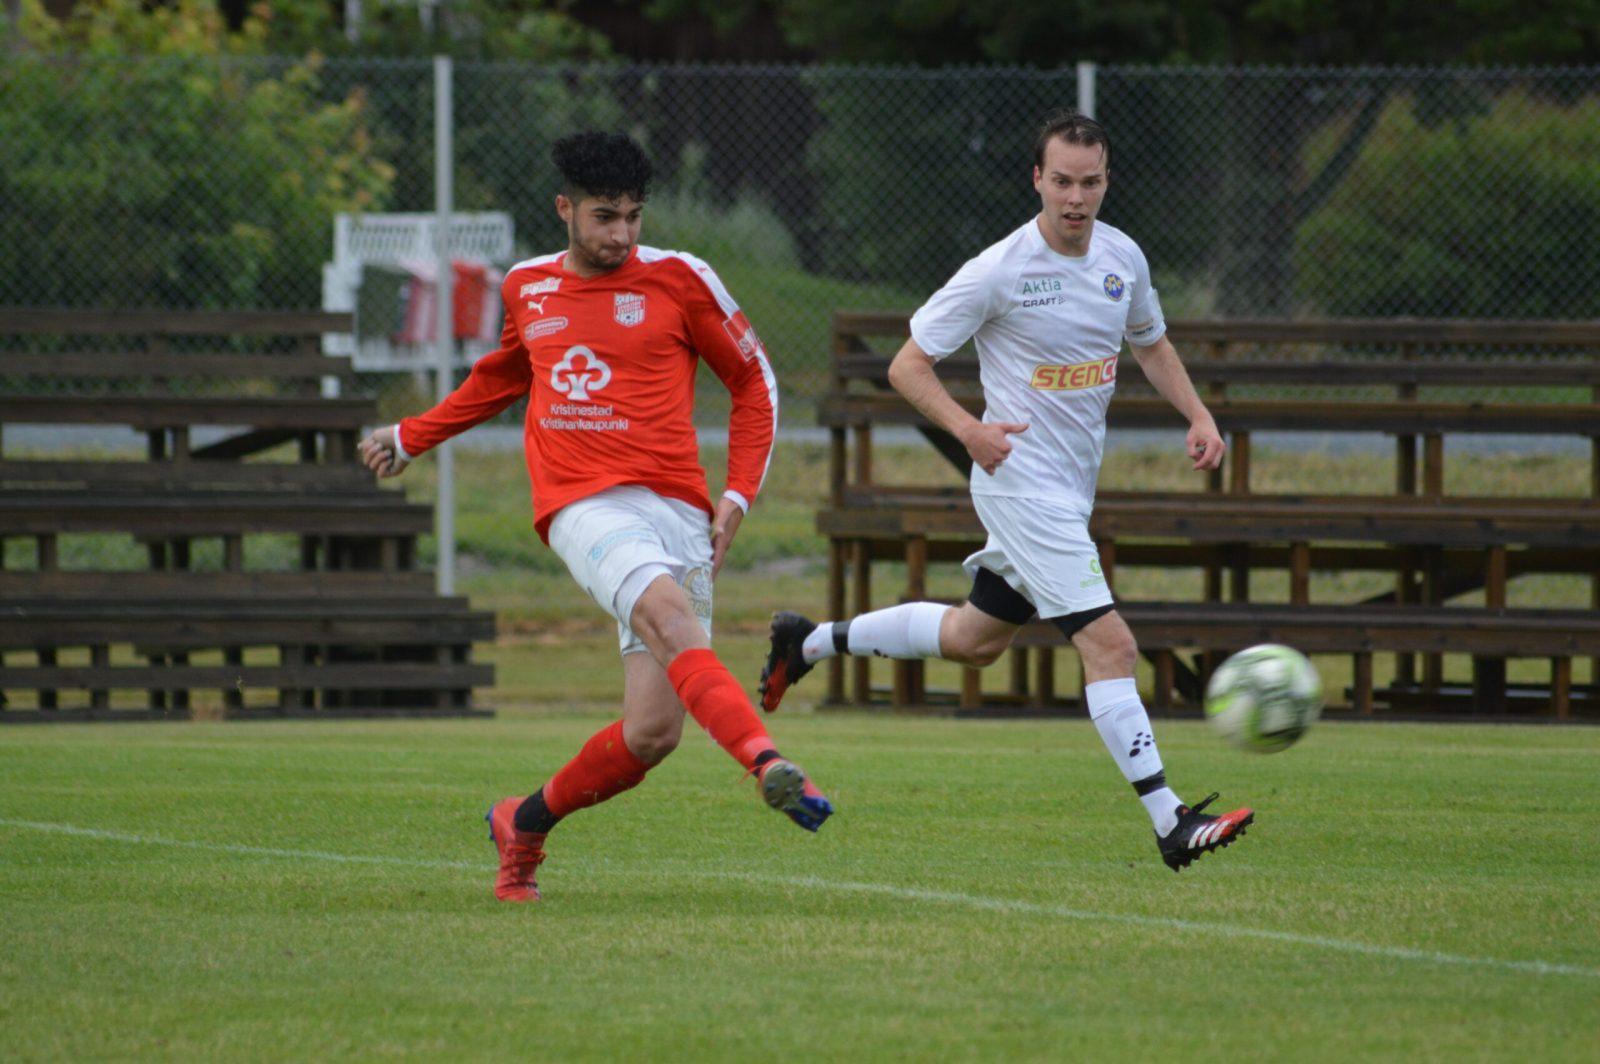 Sporting Kristina Academy – Malax IF 2-3 (1-1)